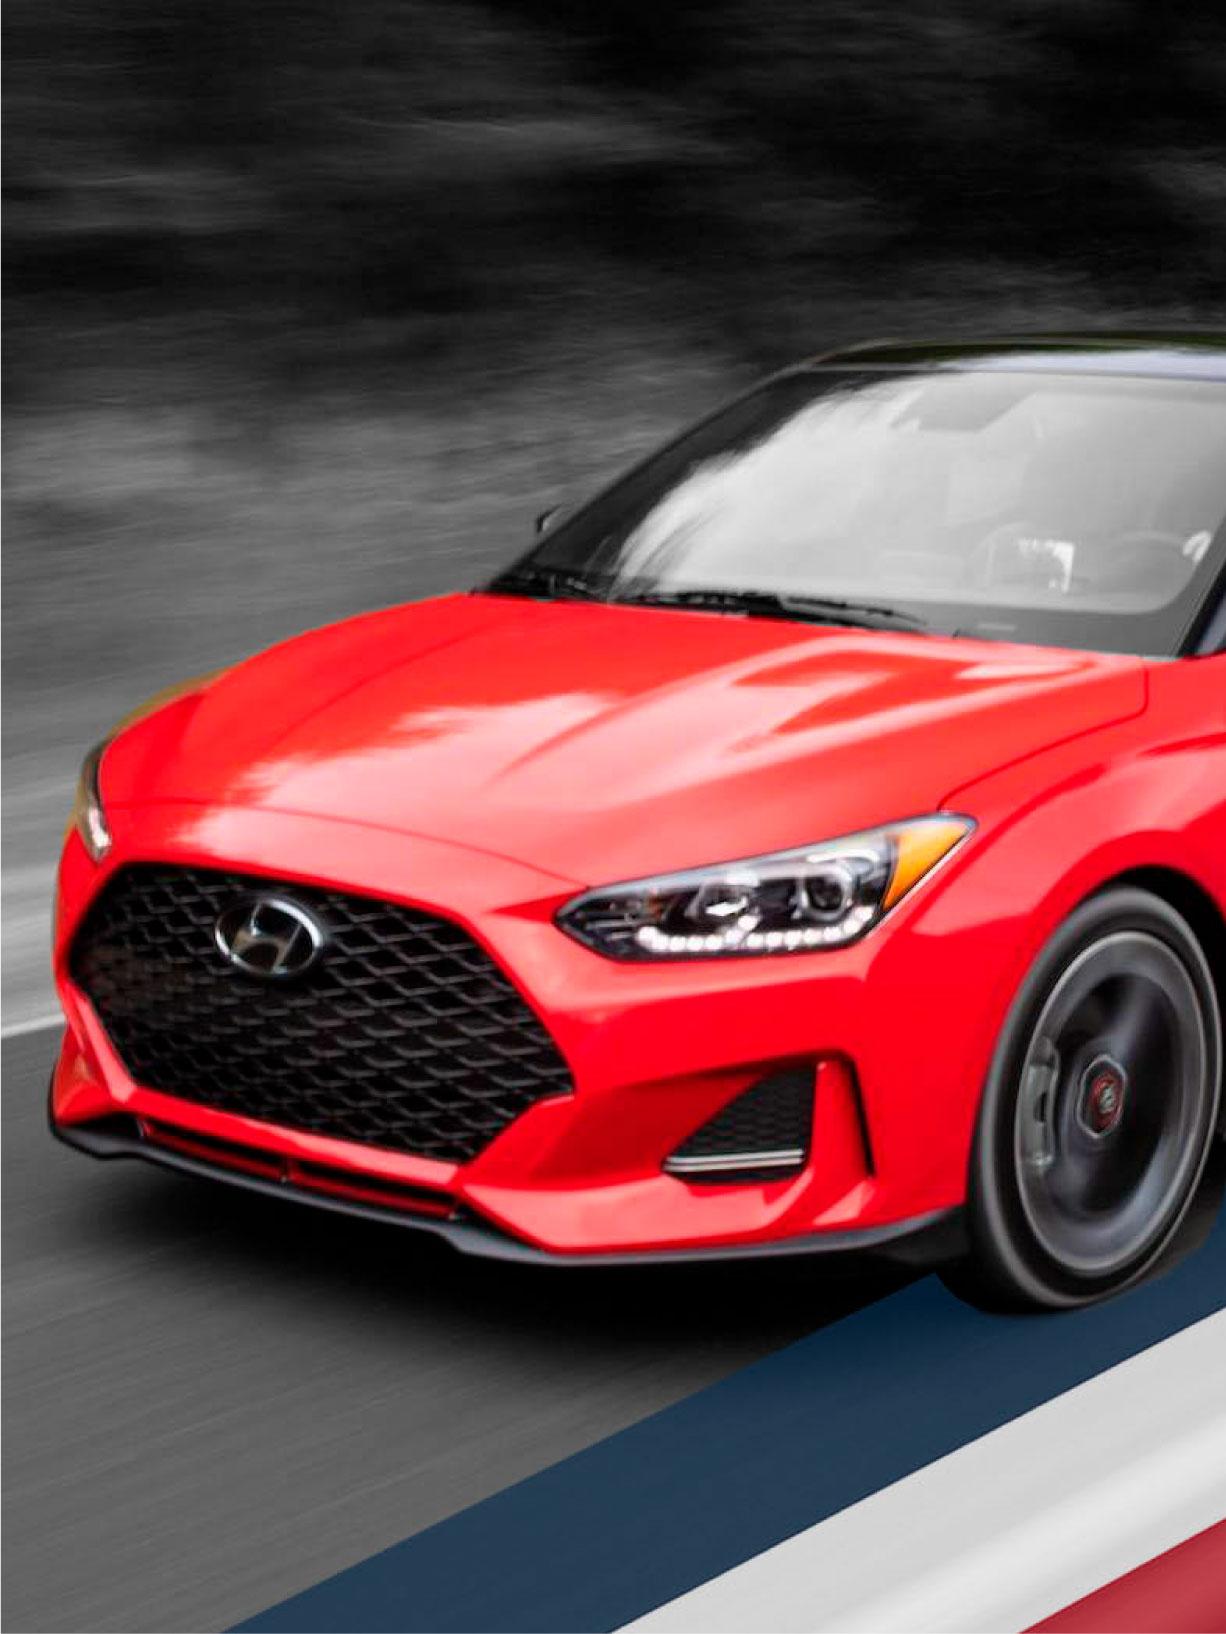 Cover S- 2019 Hyundai Veloster Nacho Autos